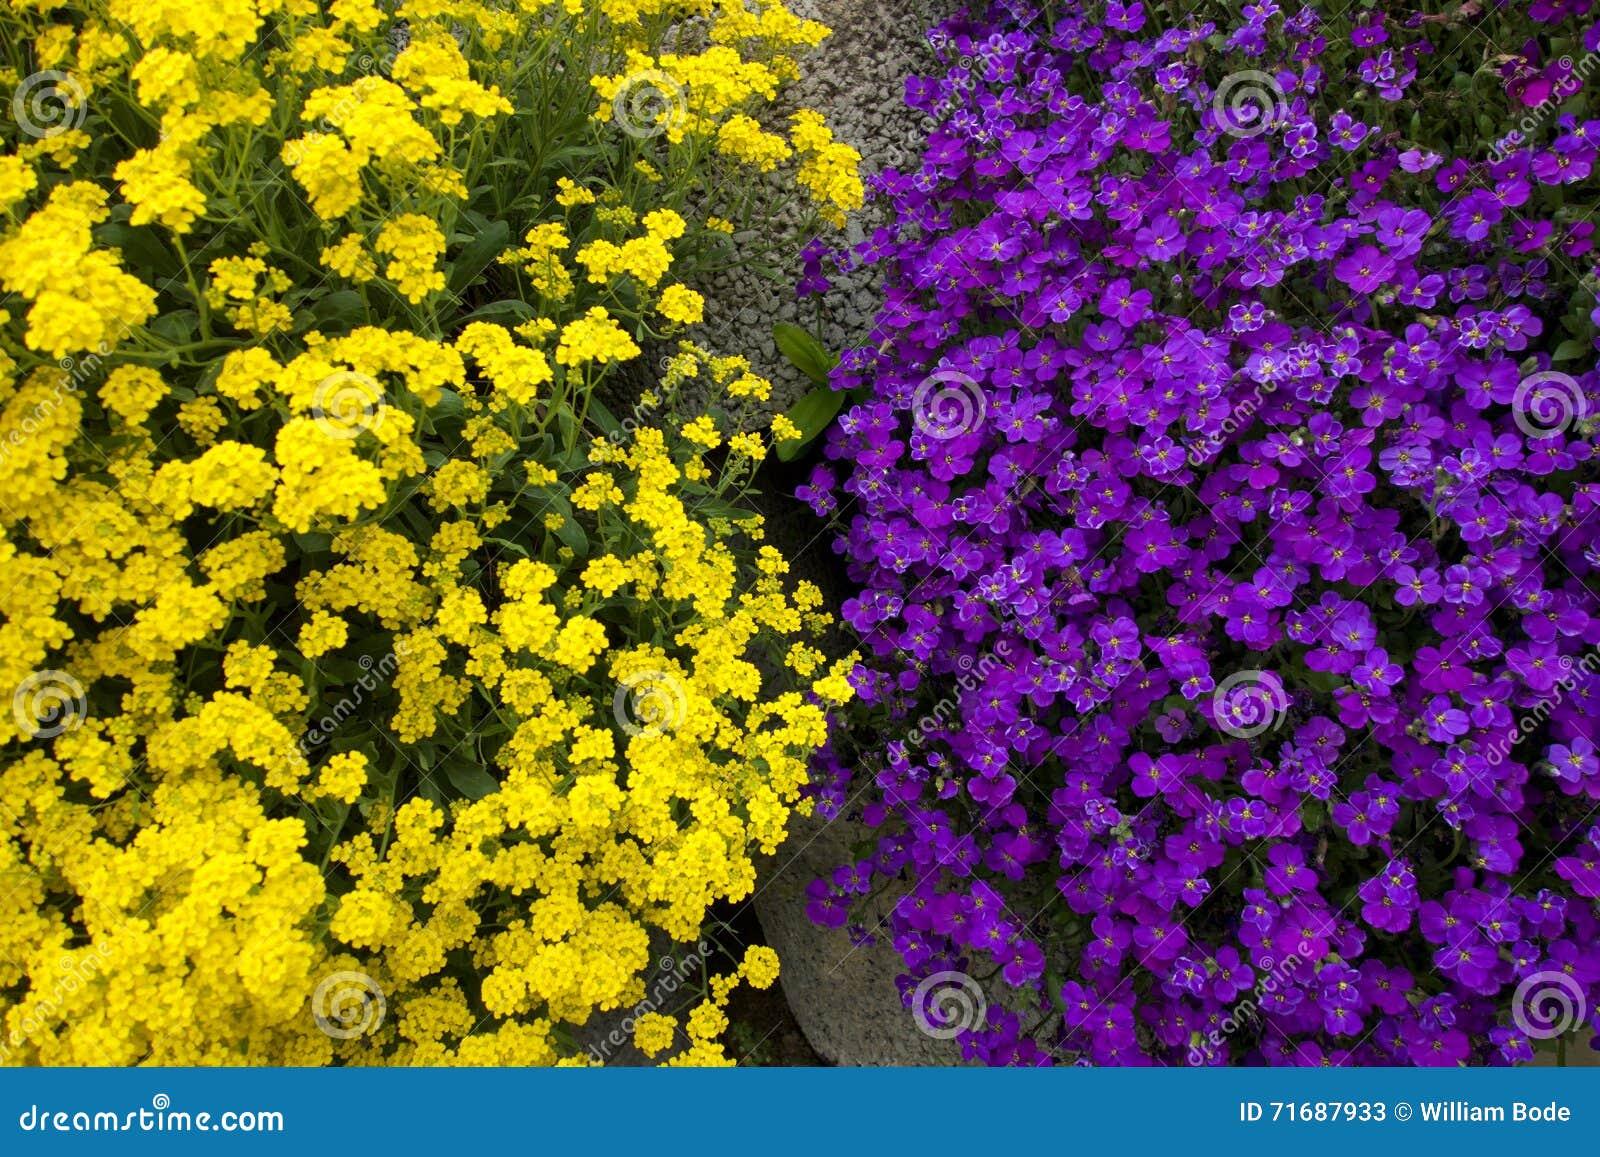 Purple And Yellow Yinyang Flowers Stock Image Image Of Like